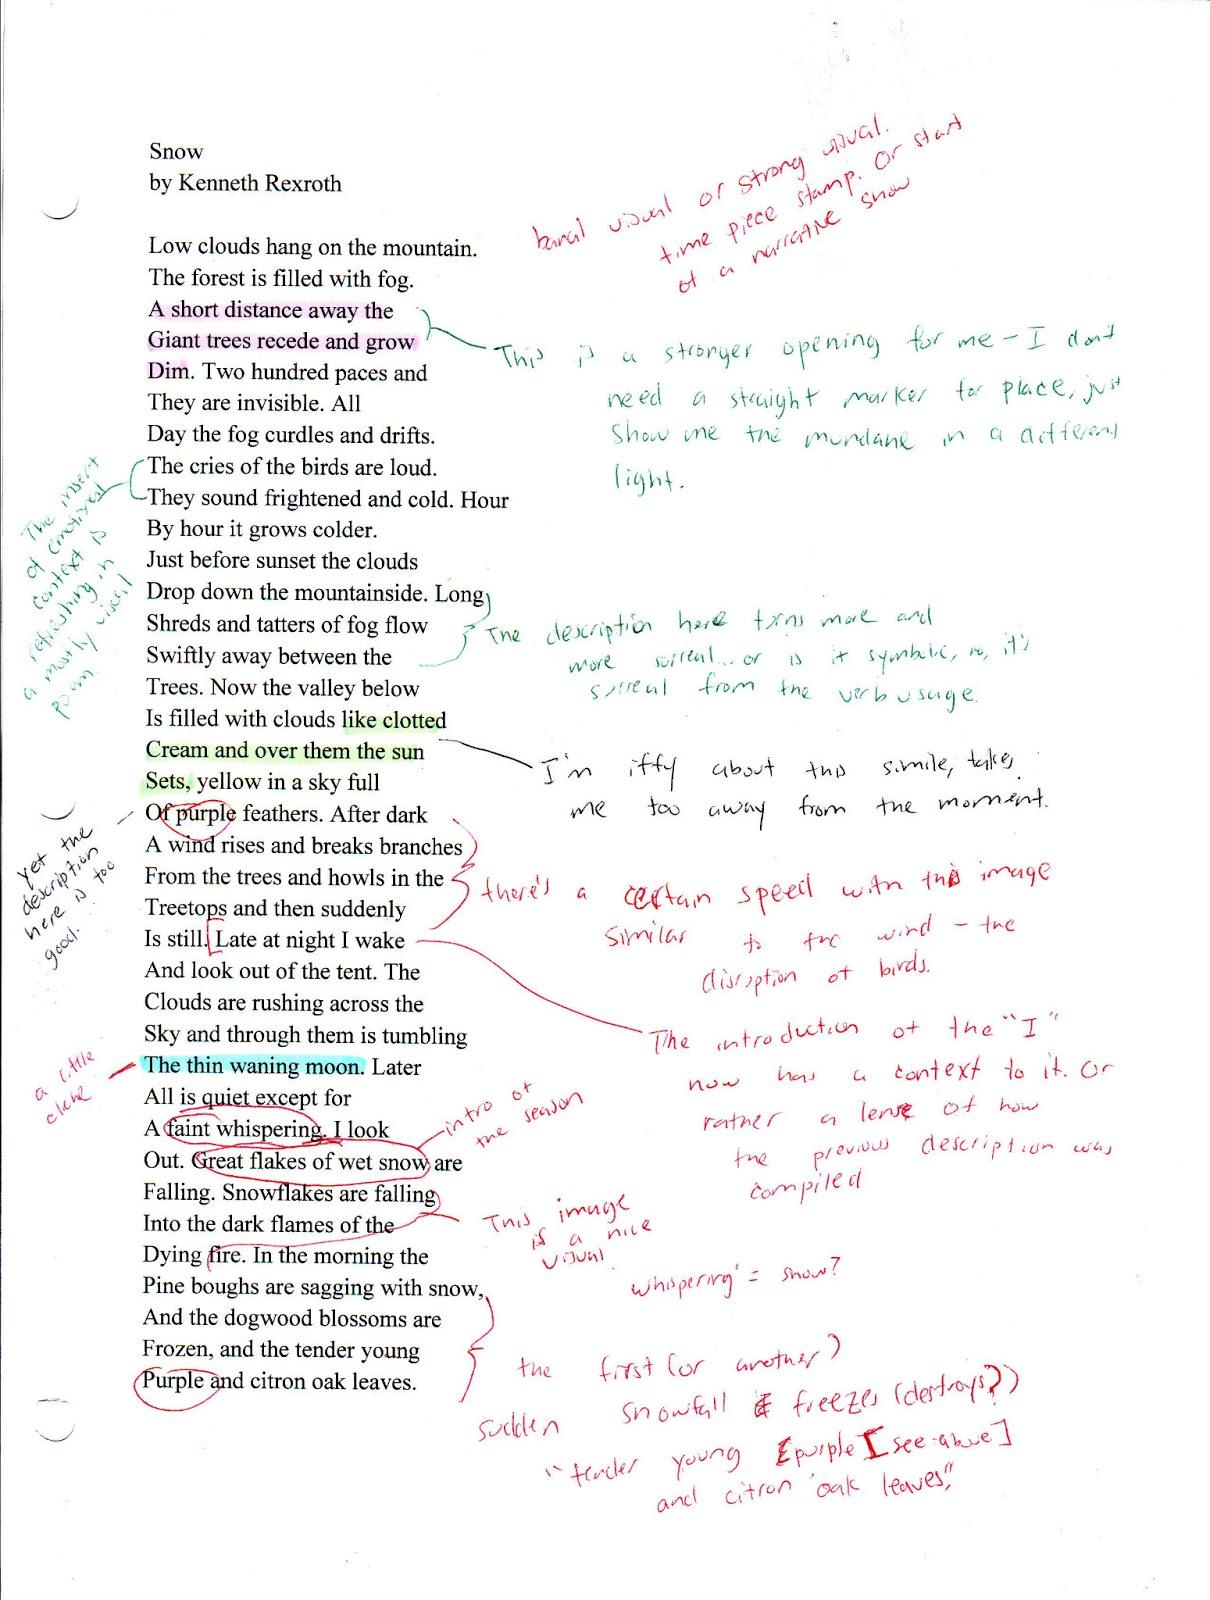 broken goals composition examination essay